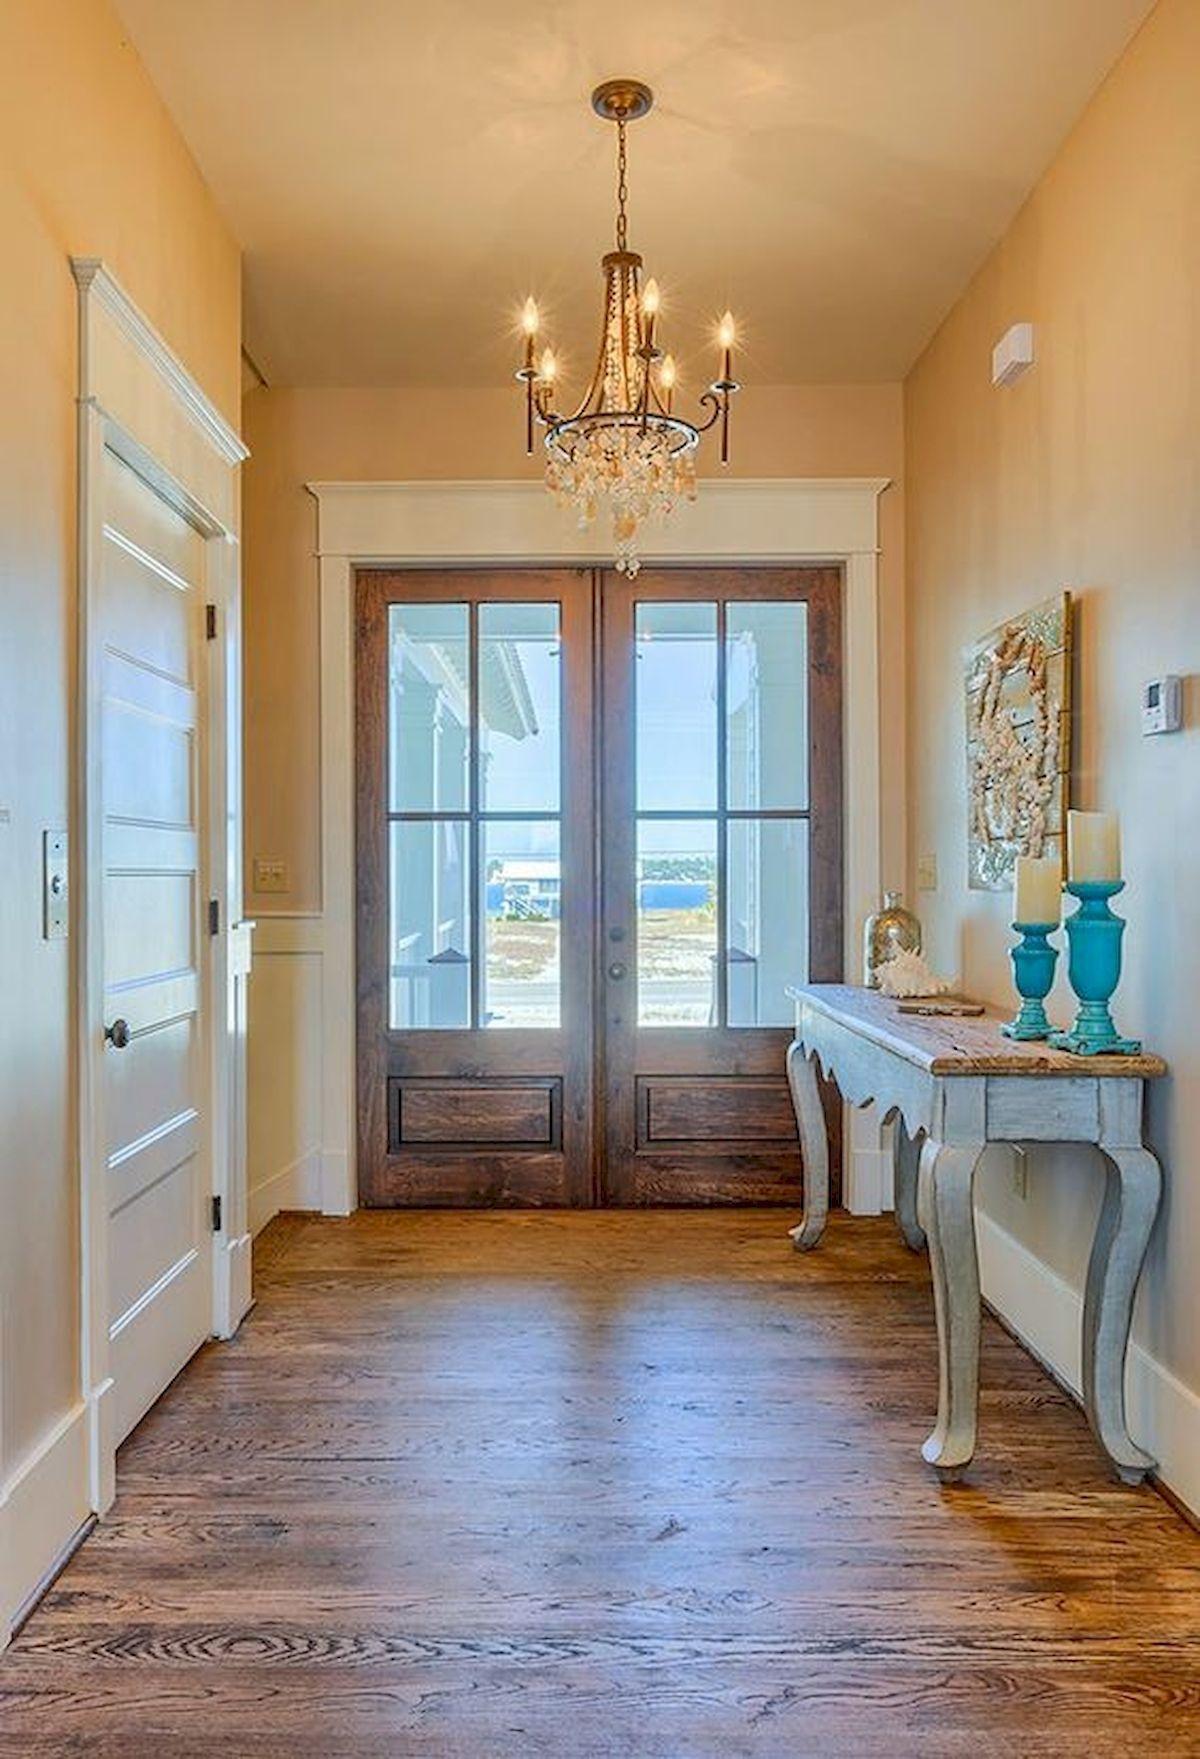 Bestes hausfrontdesign  best modern farmhouse front door entrance design ideas  in